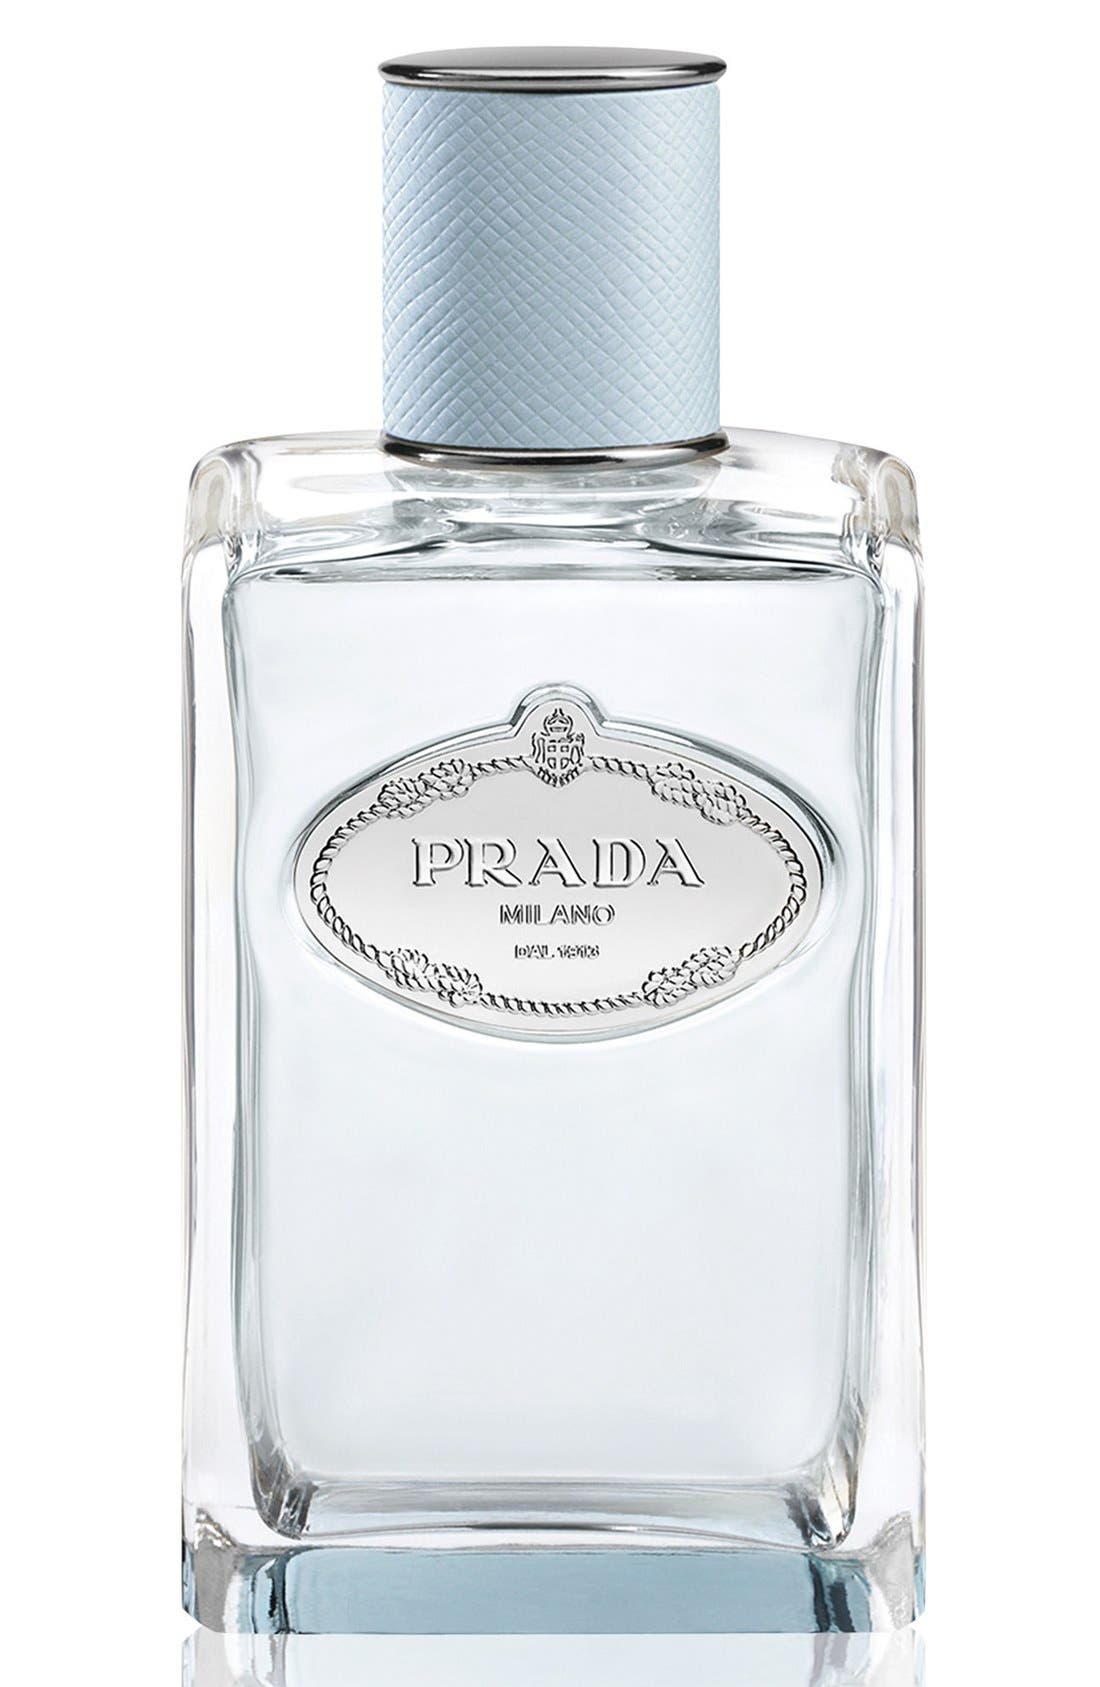 Prada Les Infusions Amande Eau de Parfum